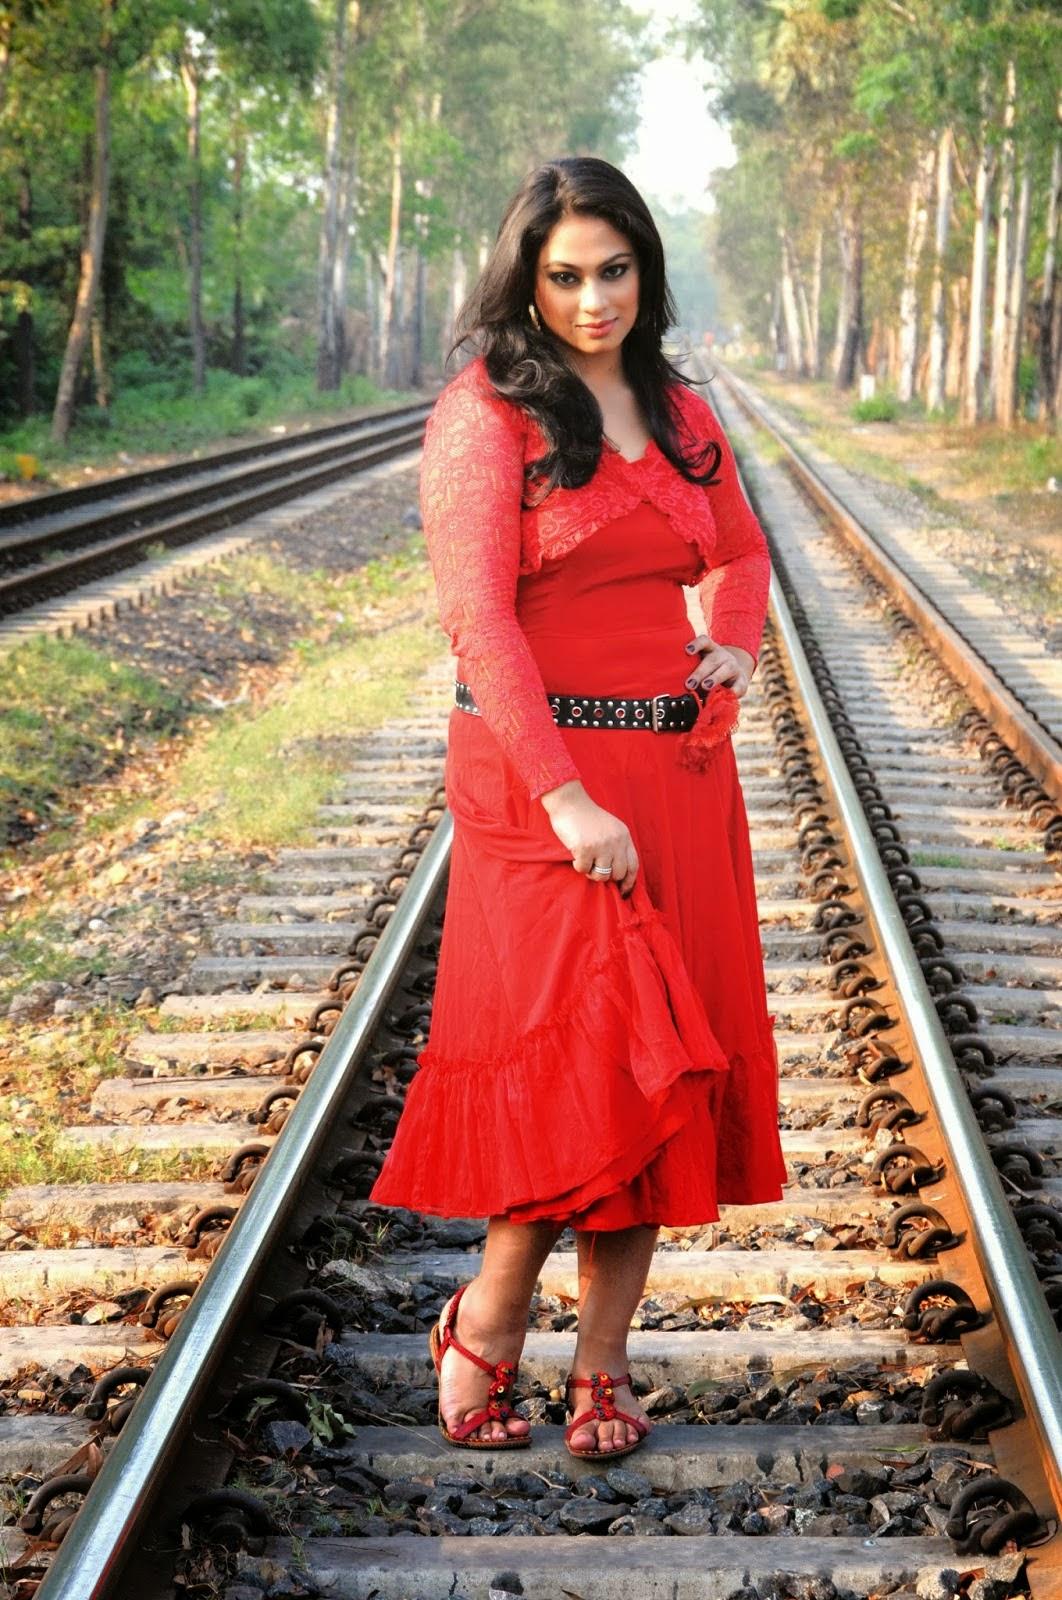 Hit Bd Sadika Parvin Popy The Hottest Actress Model Of -4971